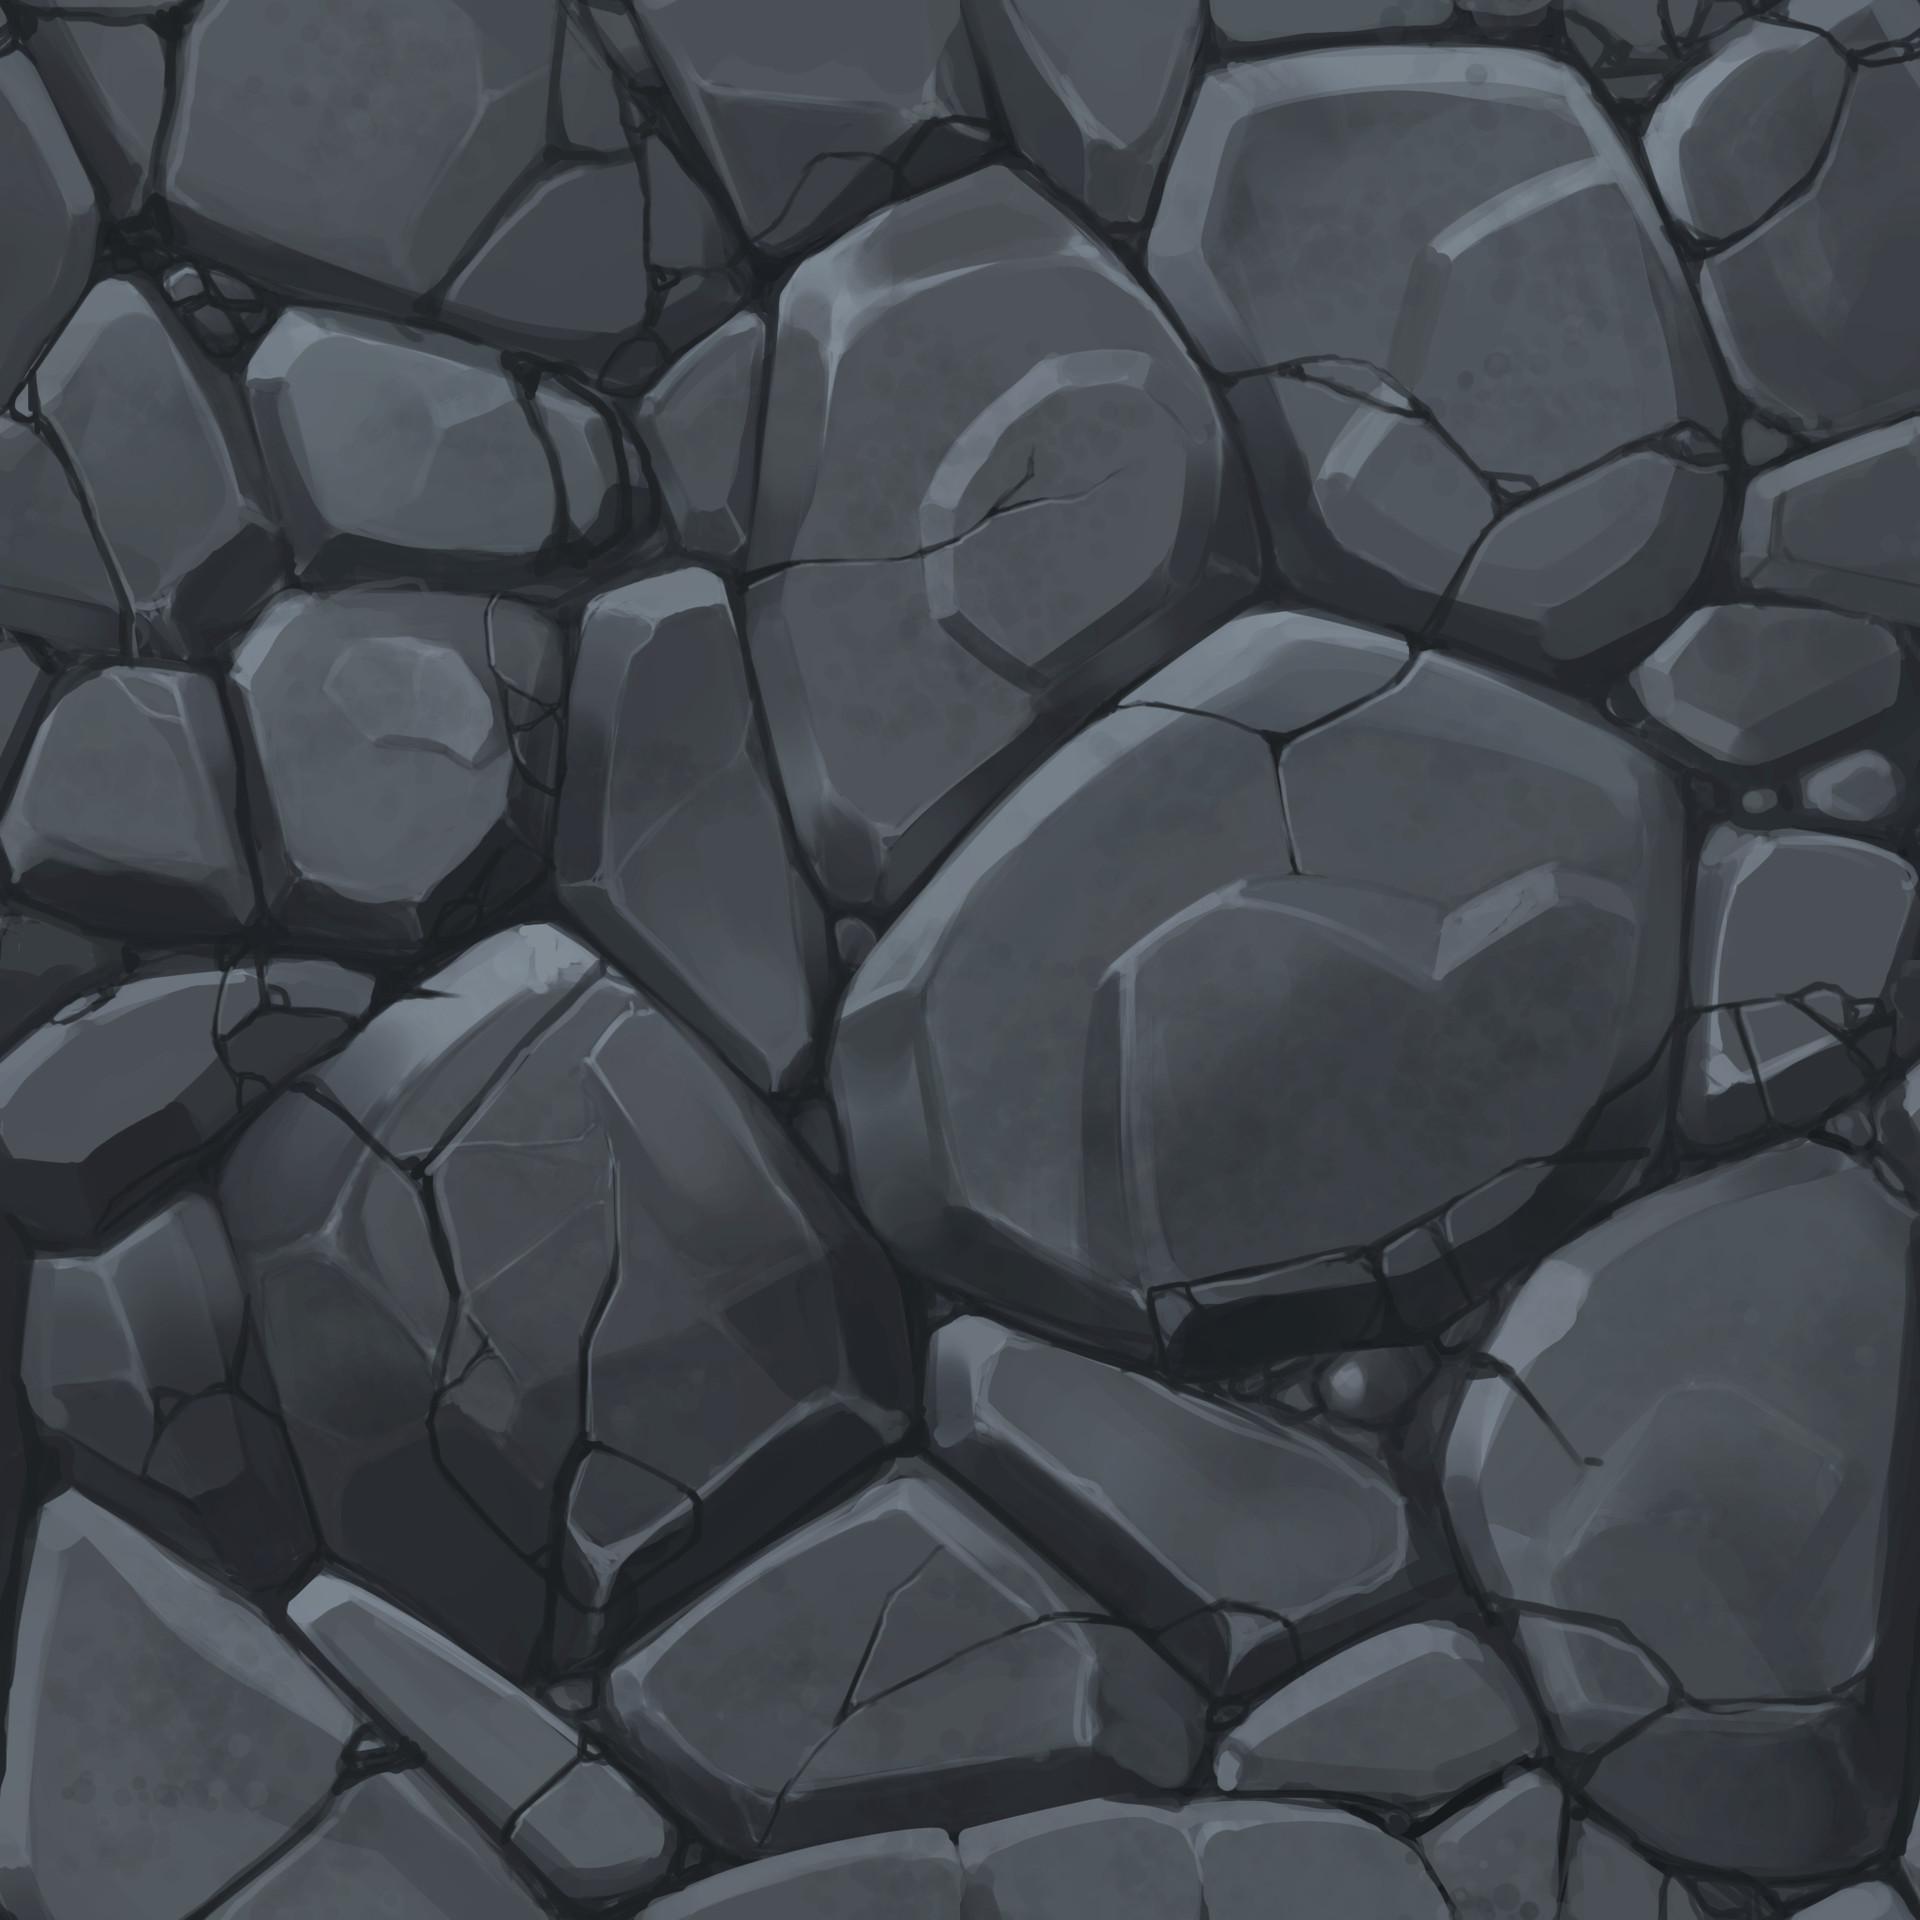 Peter burroughs stonetexture